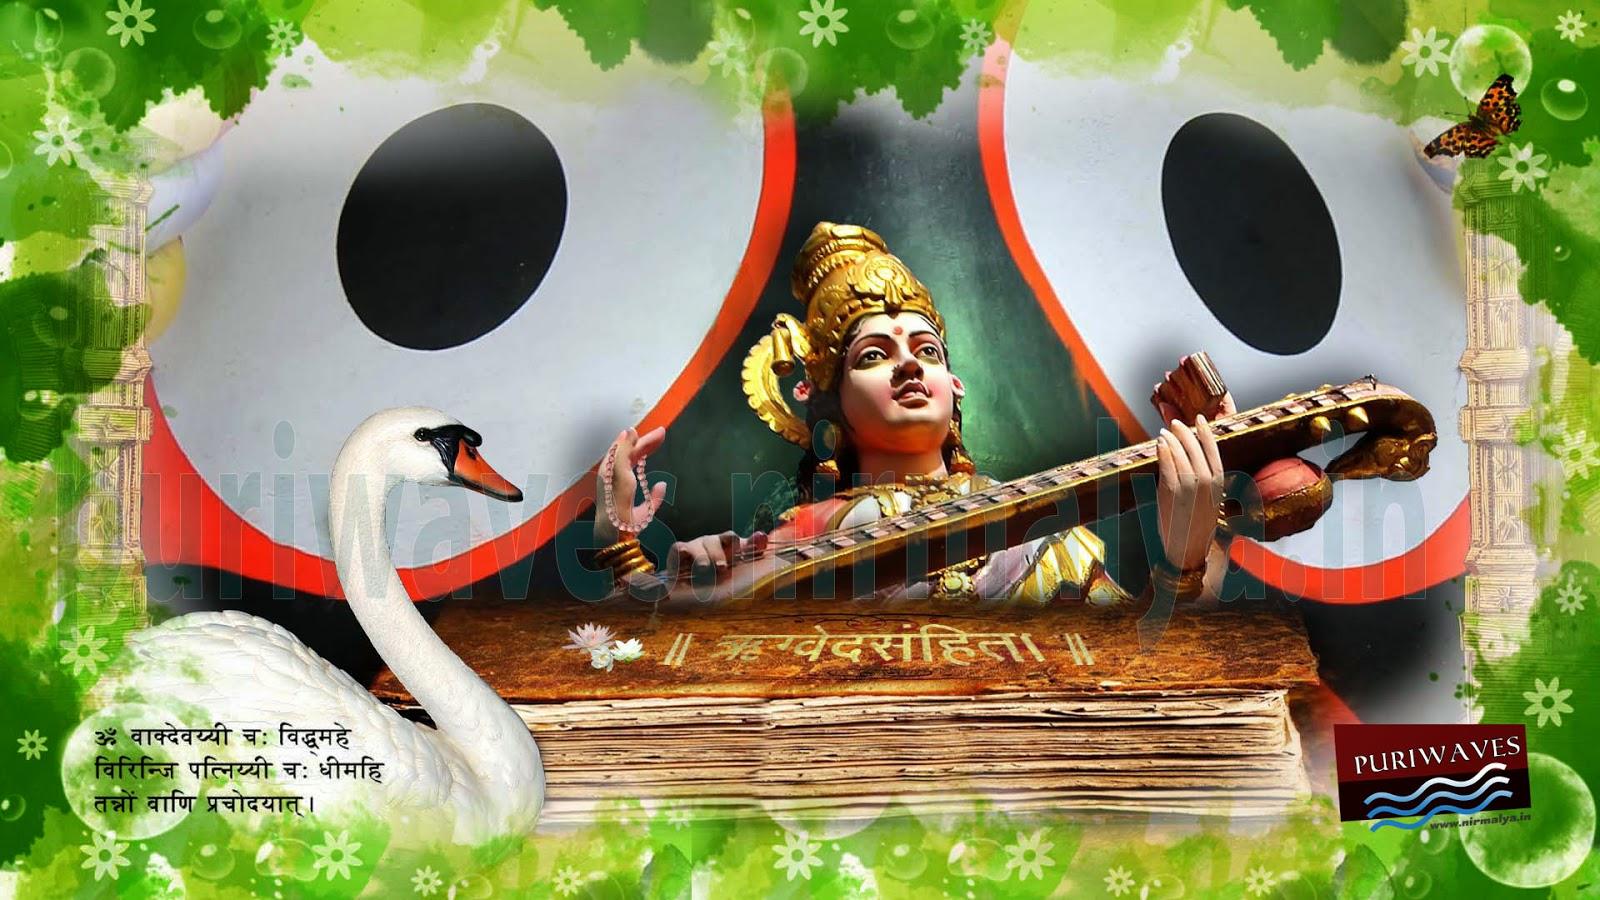 Must see Wallpaper Lord Jagannath Puri - saraswati+HD+wallpaper  Picture_222771.jpg